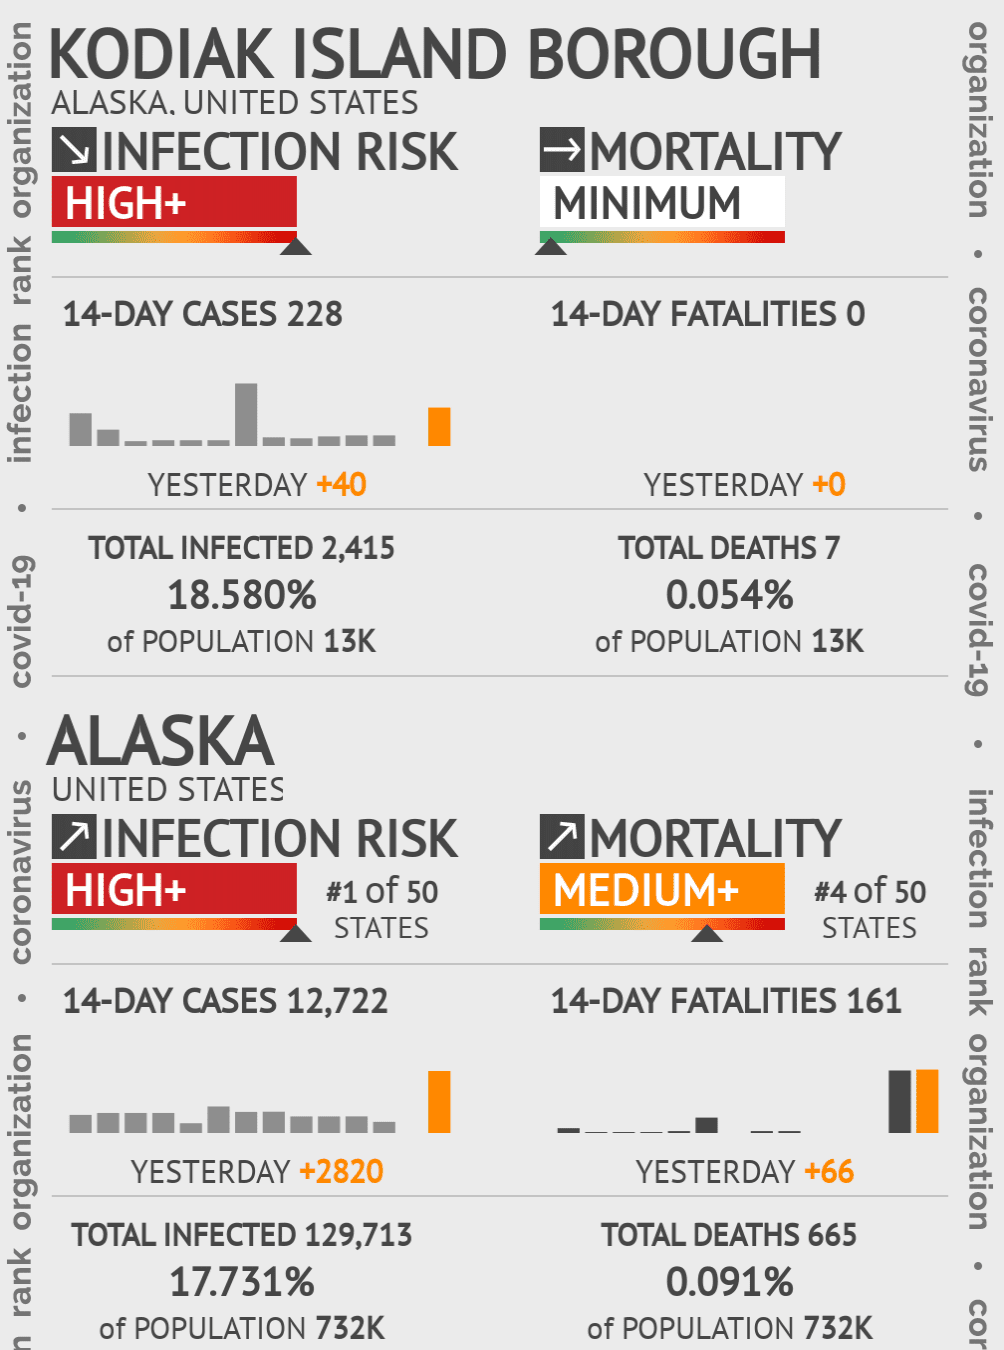 Kodiak Island Borough Coronavirus Covid-19 Risk of Infection on March 04, 2021